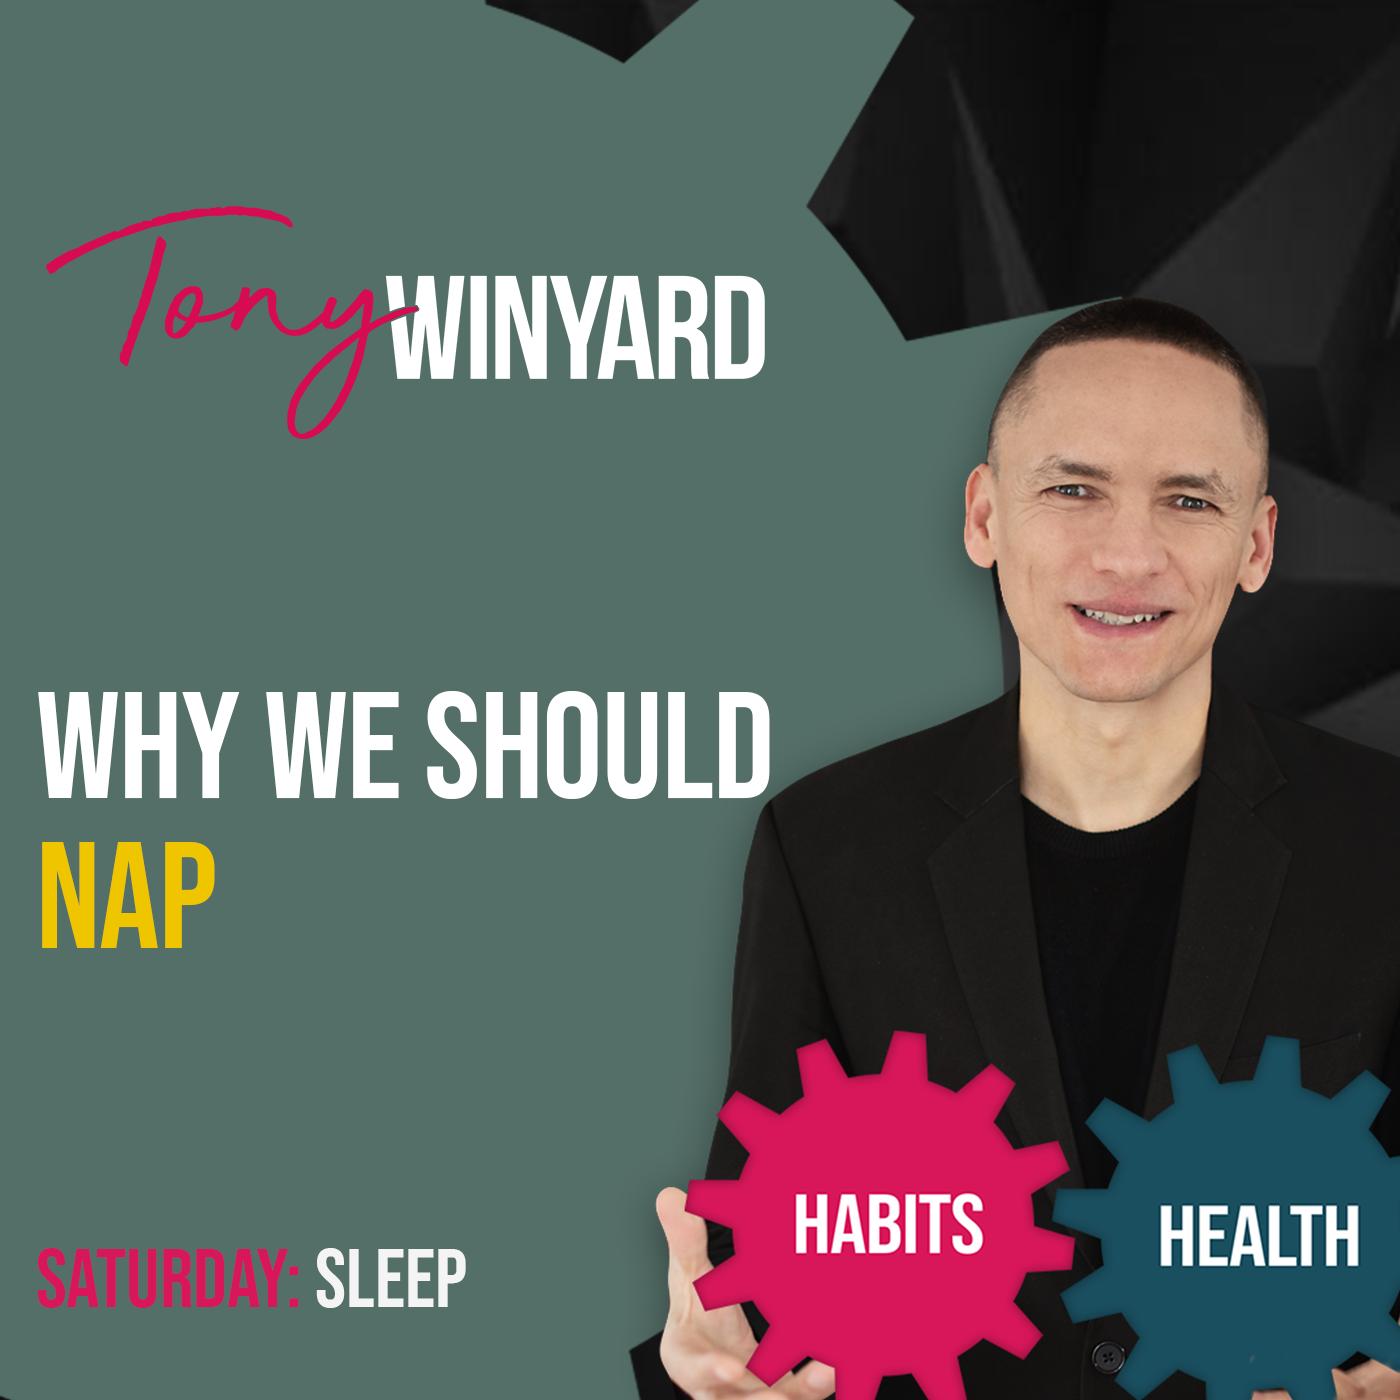 Why should we nap?